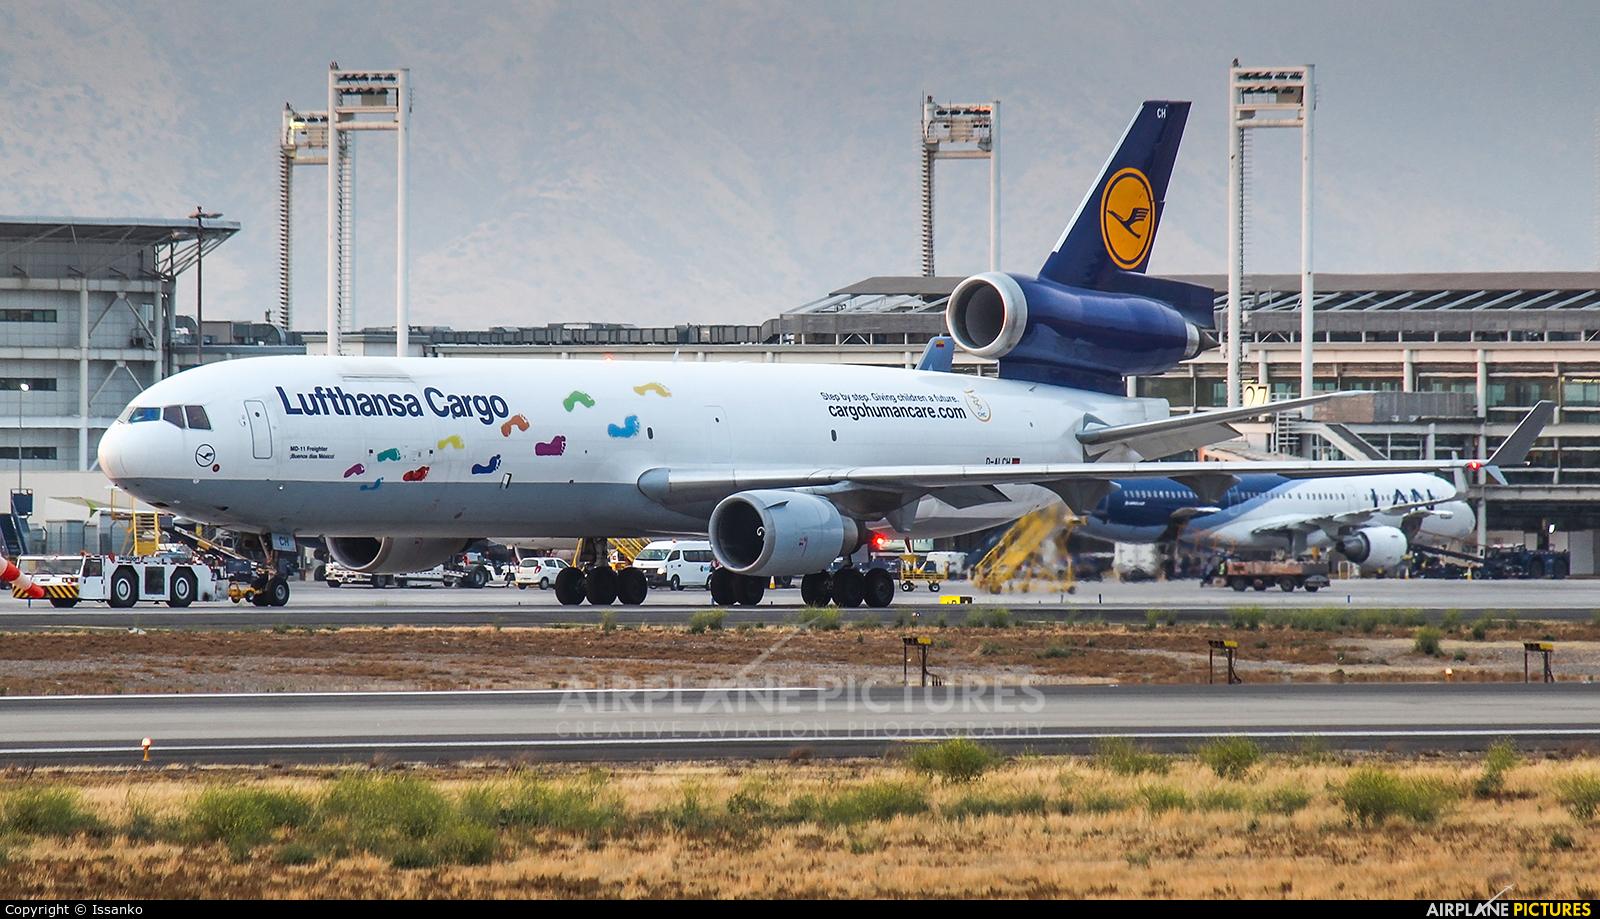 Lufthansa Cargo D-ALCH aircraft at Santiago de Chile - Arturo Merino Benítez Intl